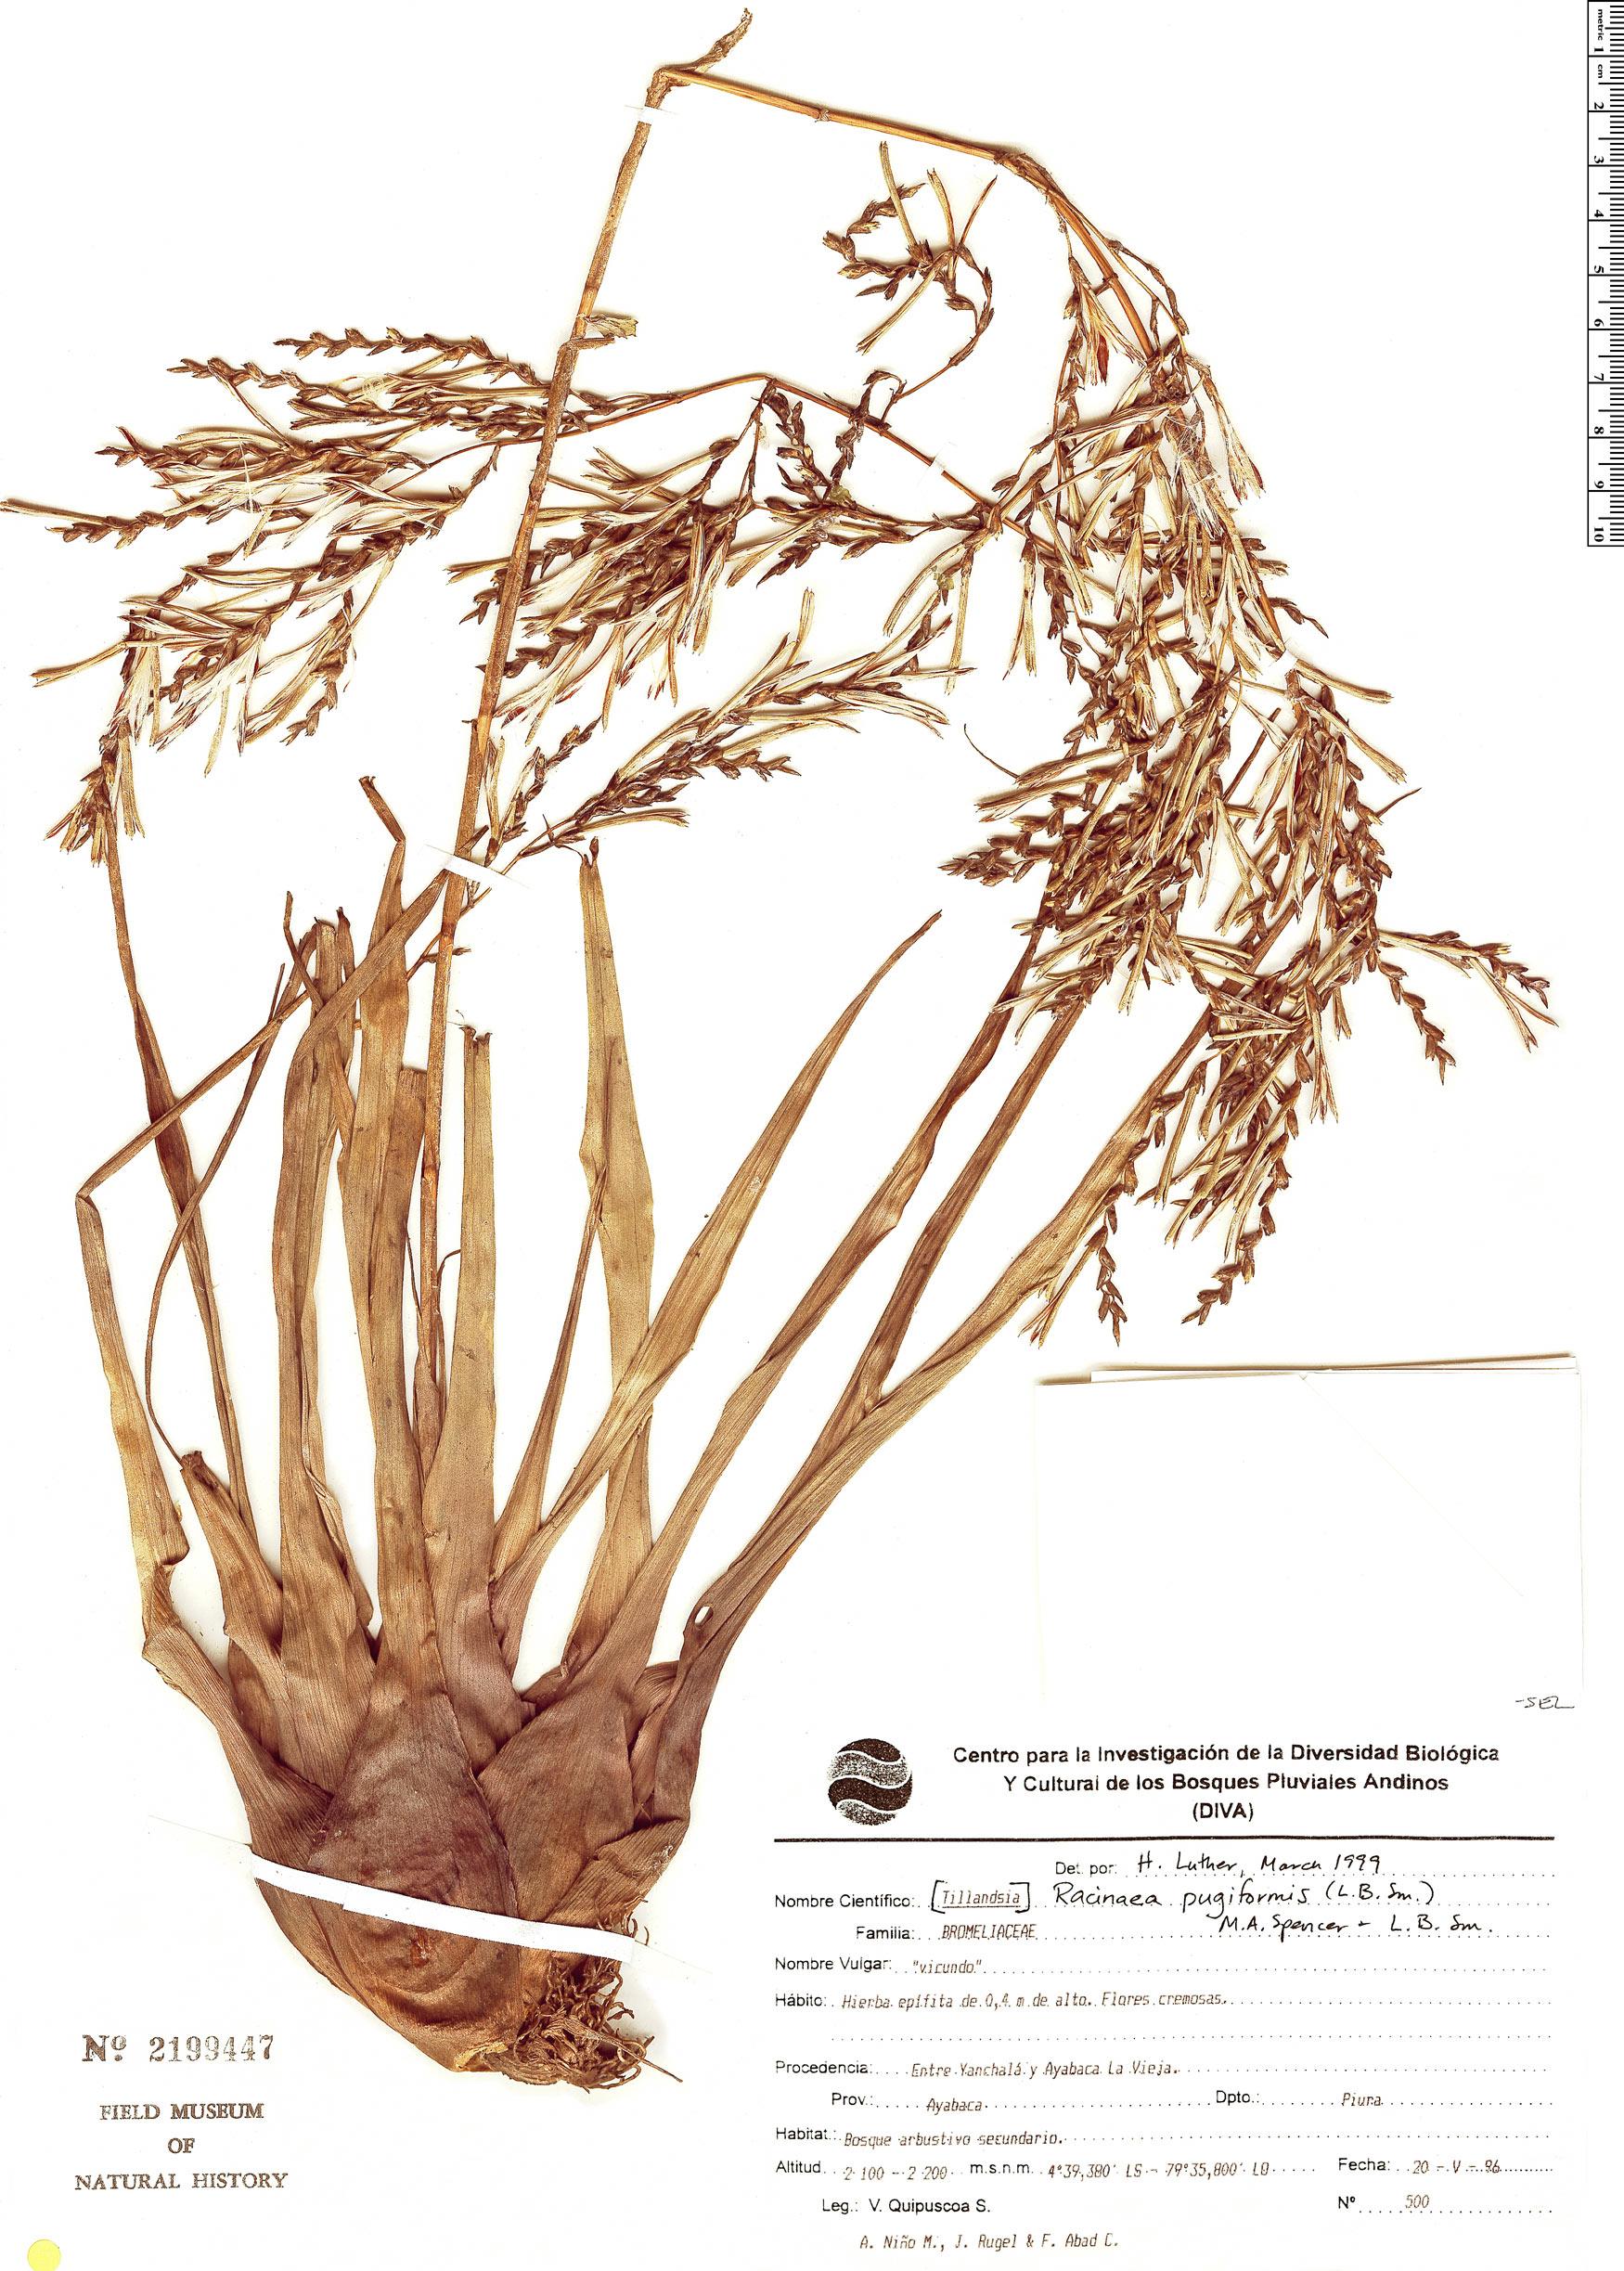 Specimen: Racinaea pugiformis